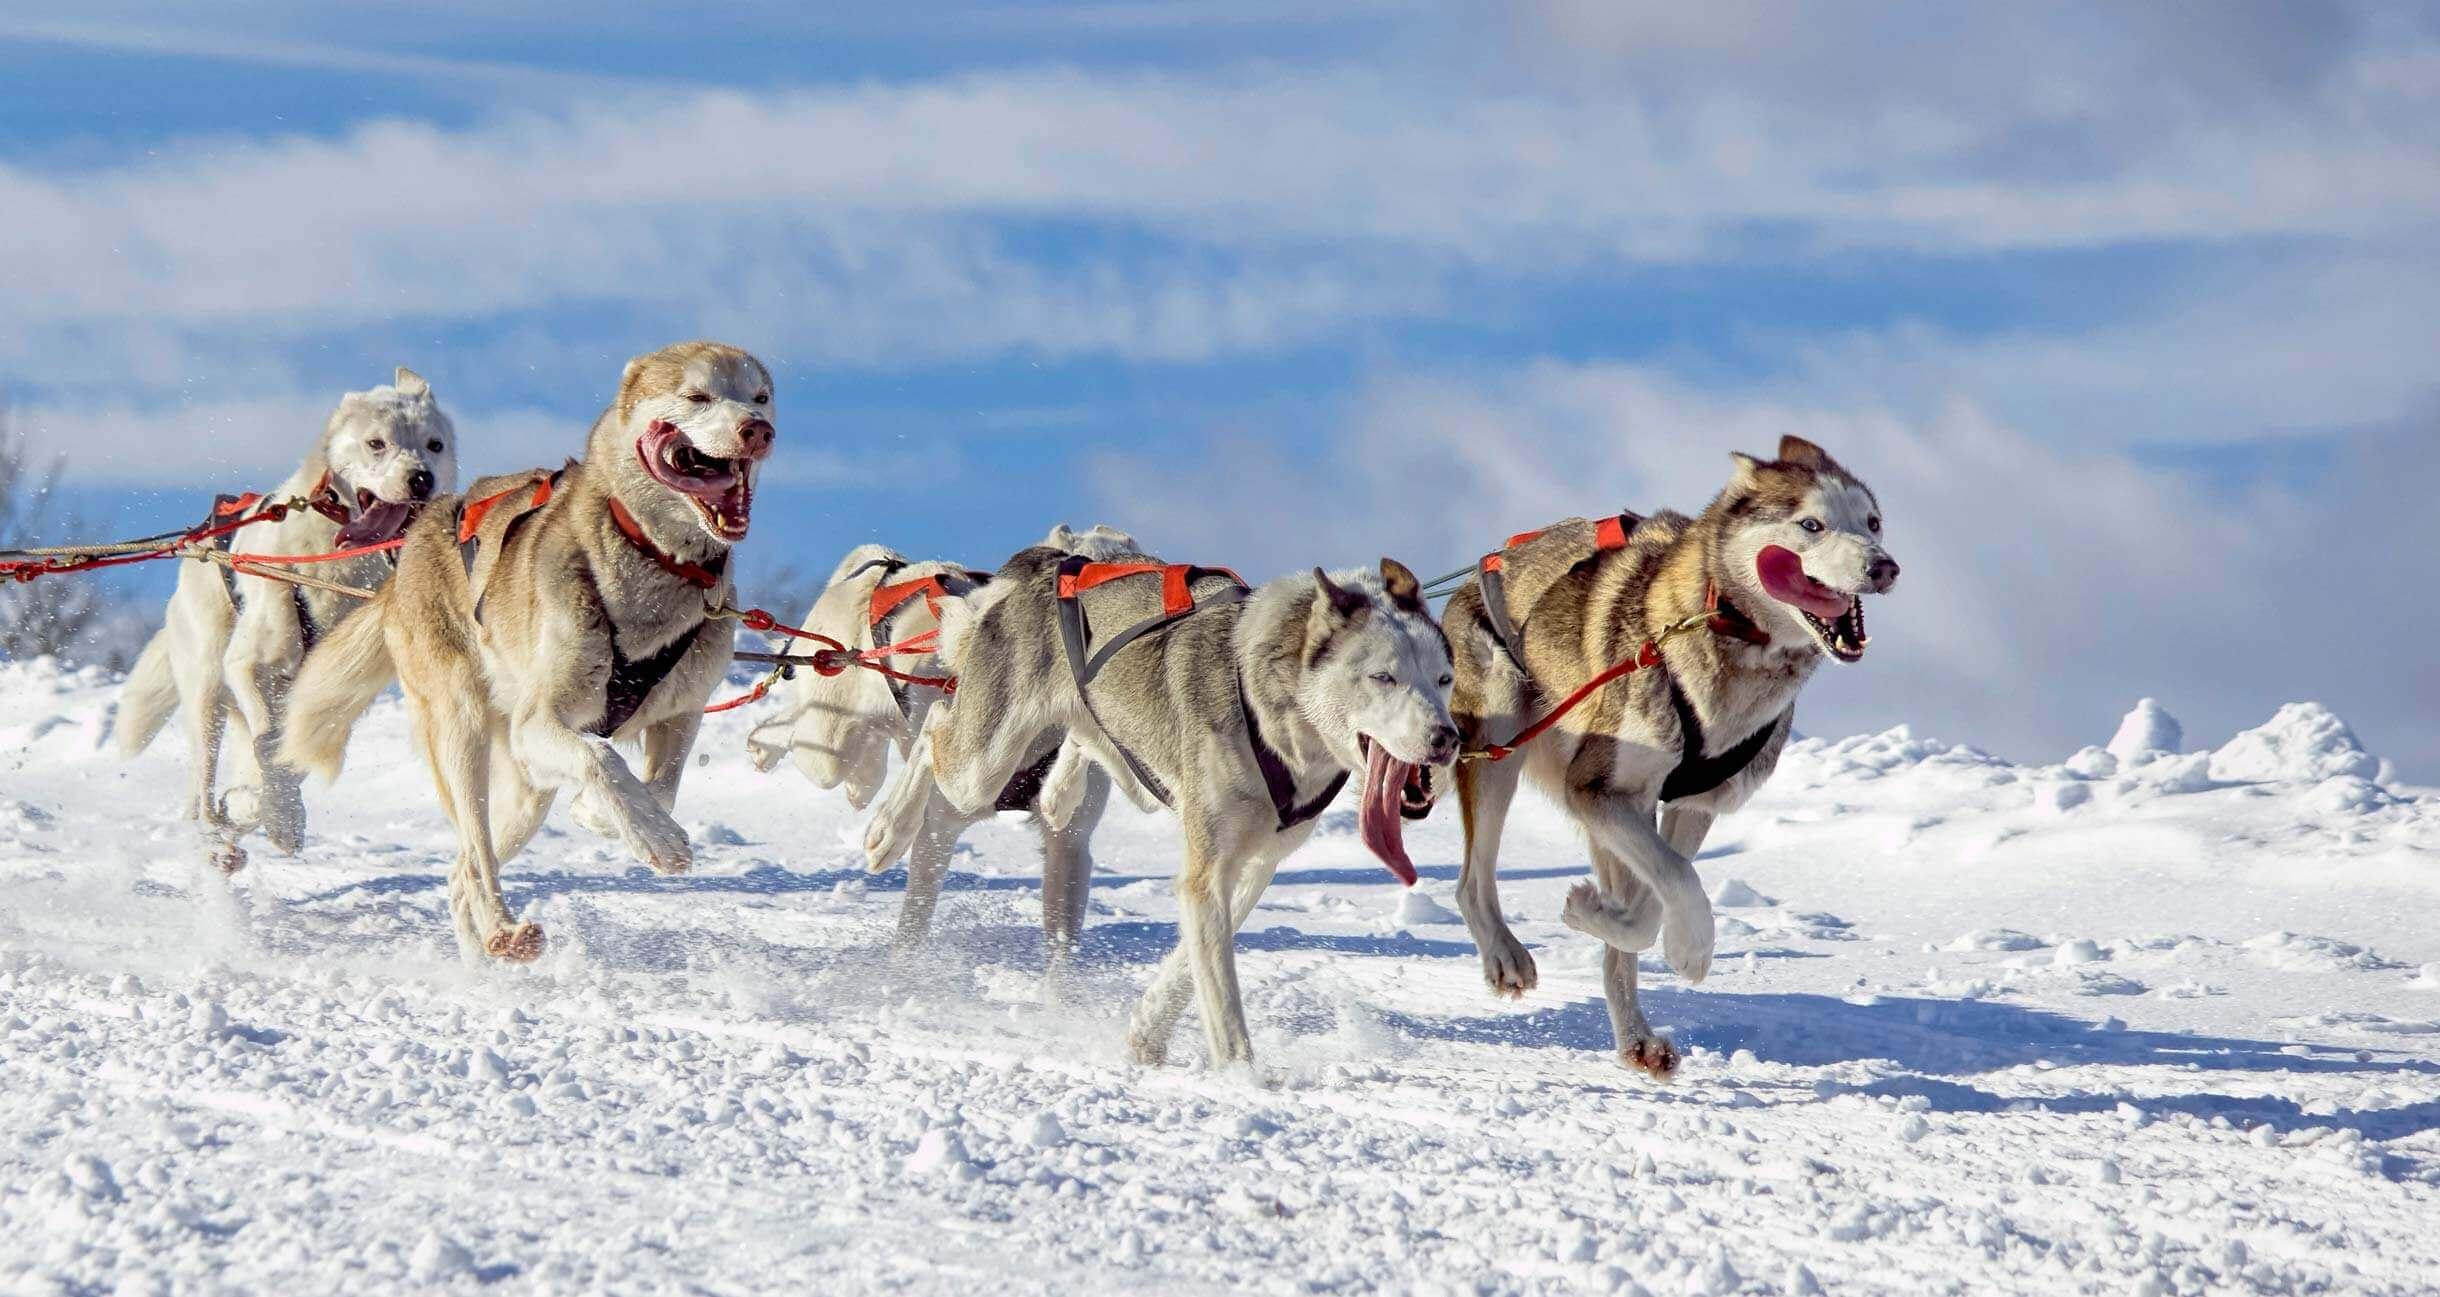 dog sled team running through snow